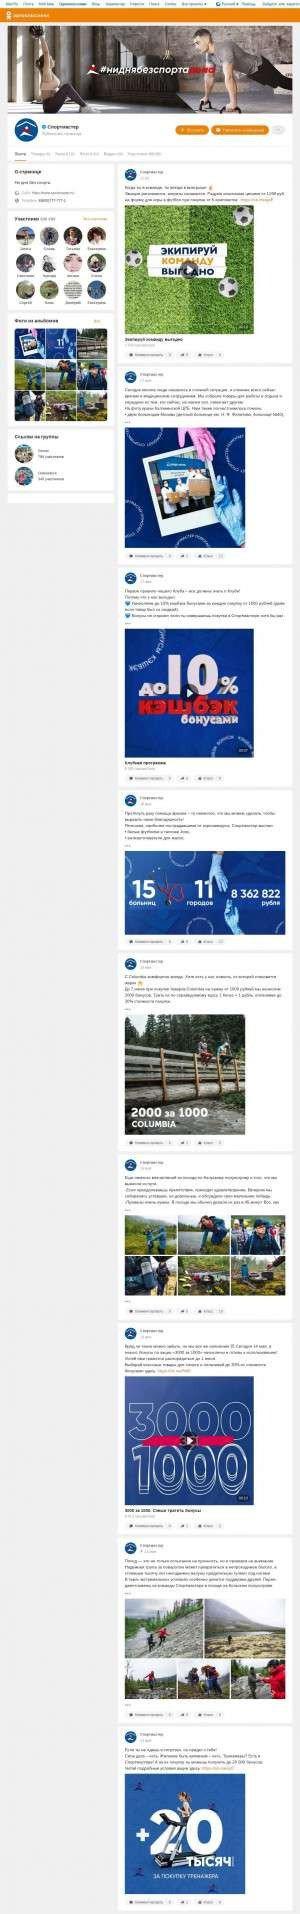 Предпросмотр для ok.ru — Спортмастер